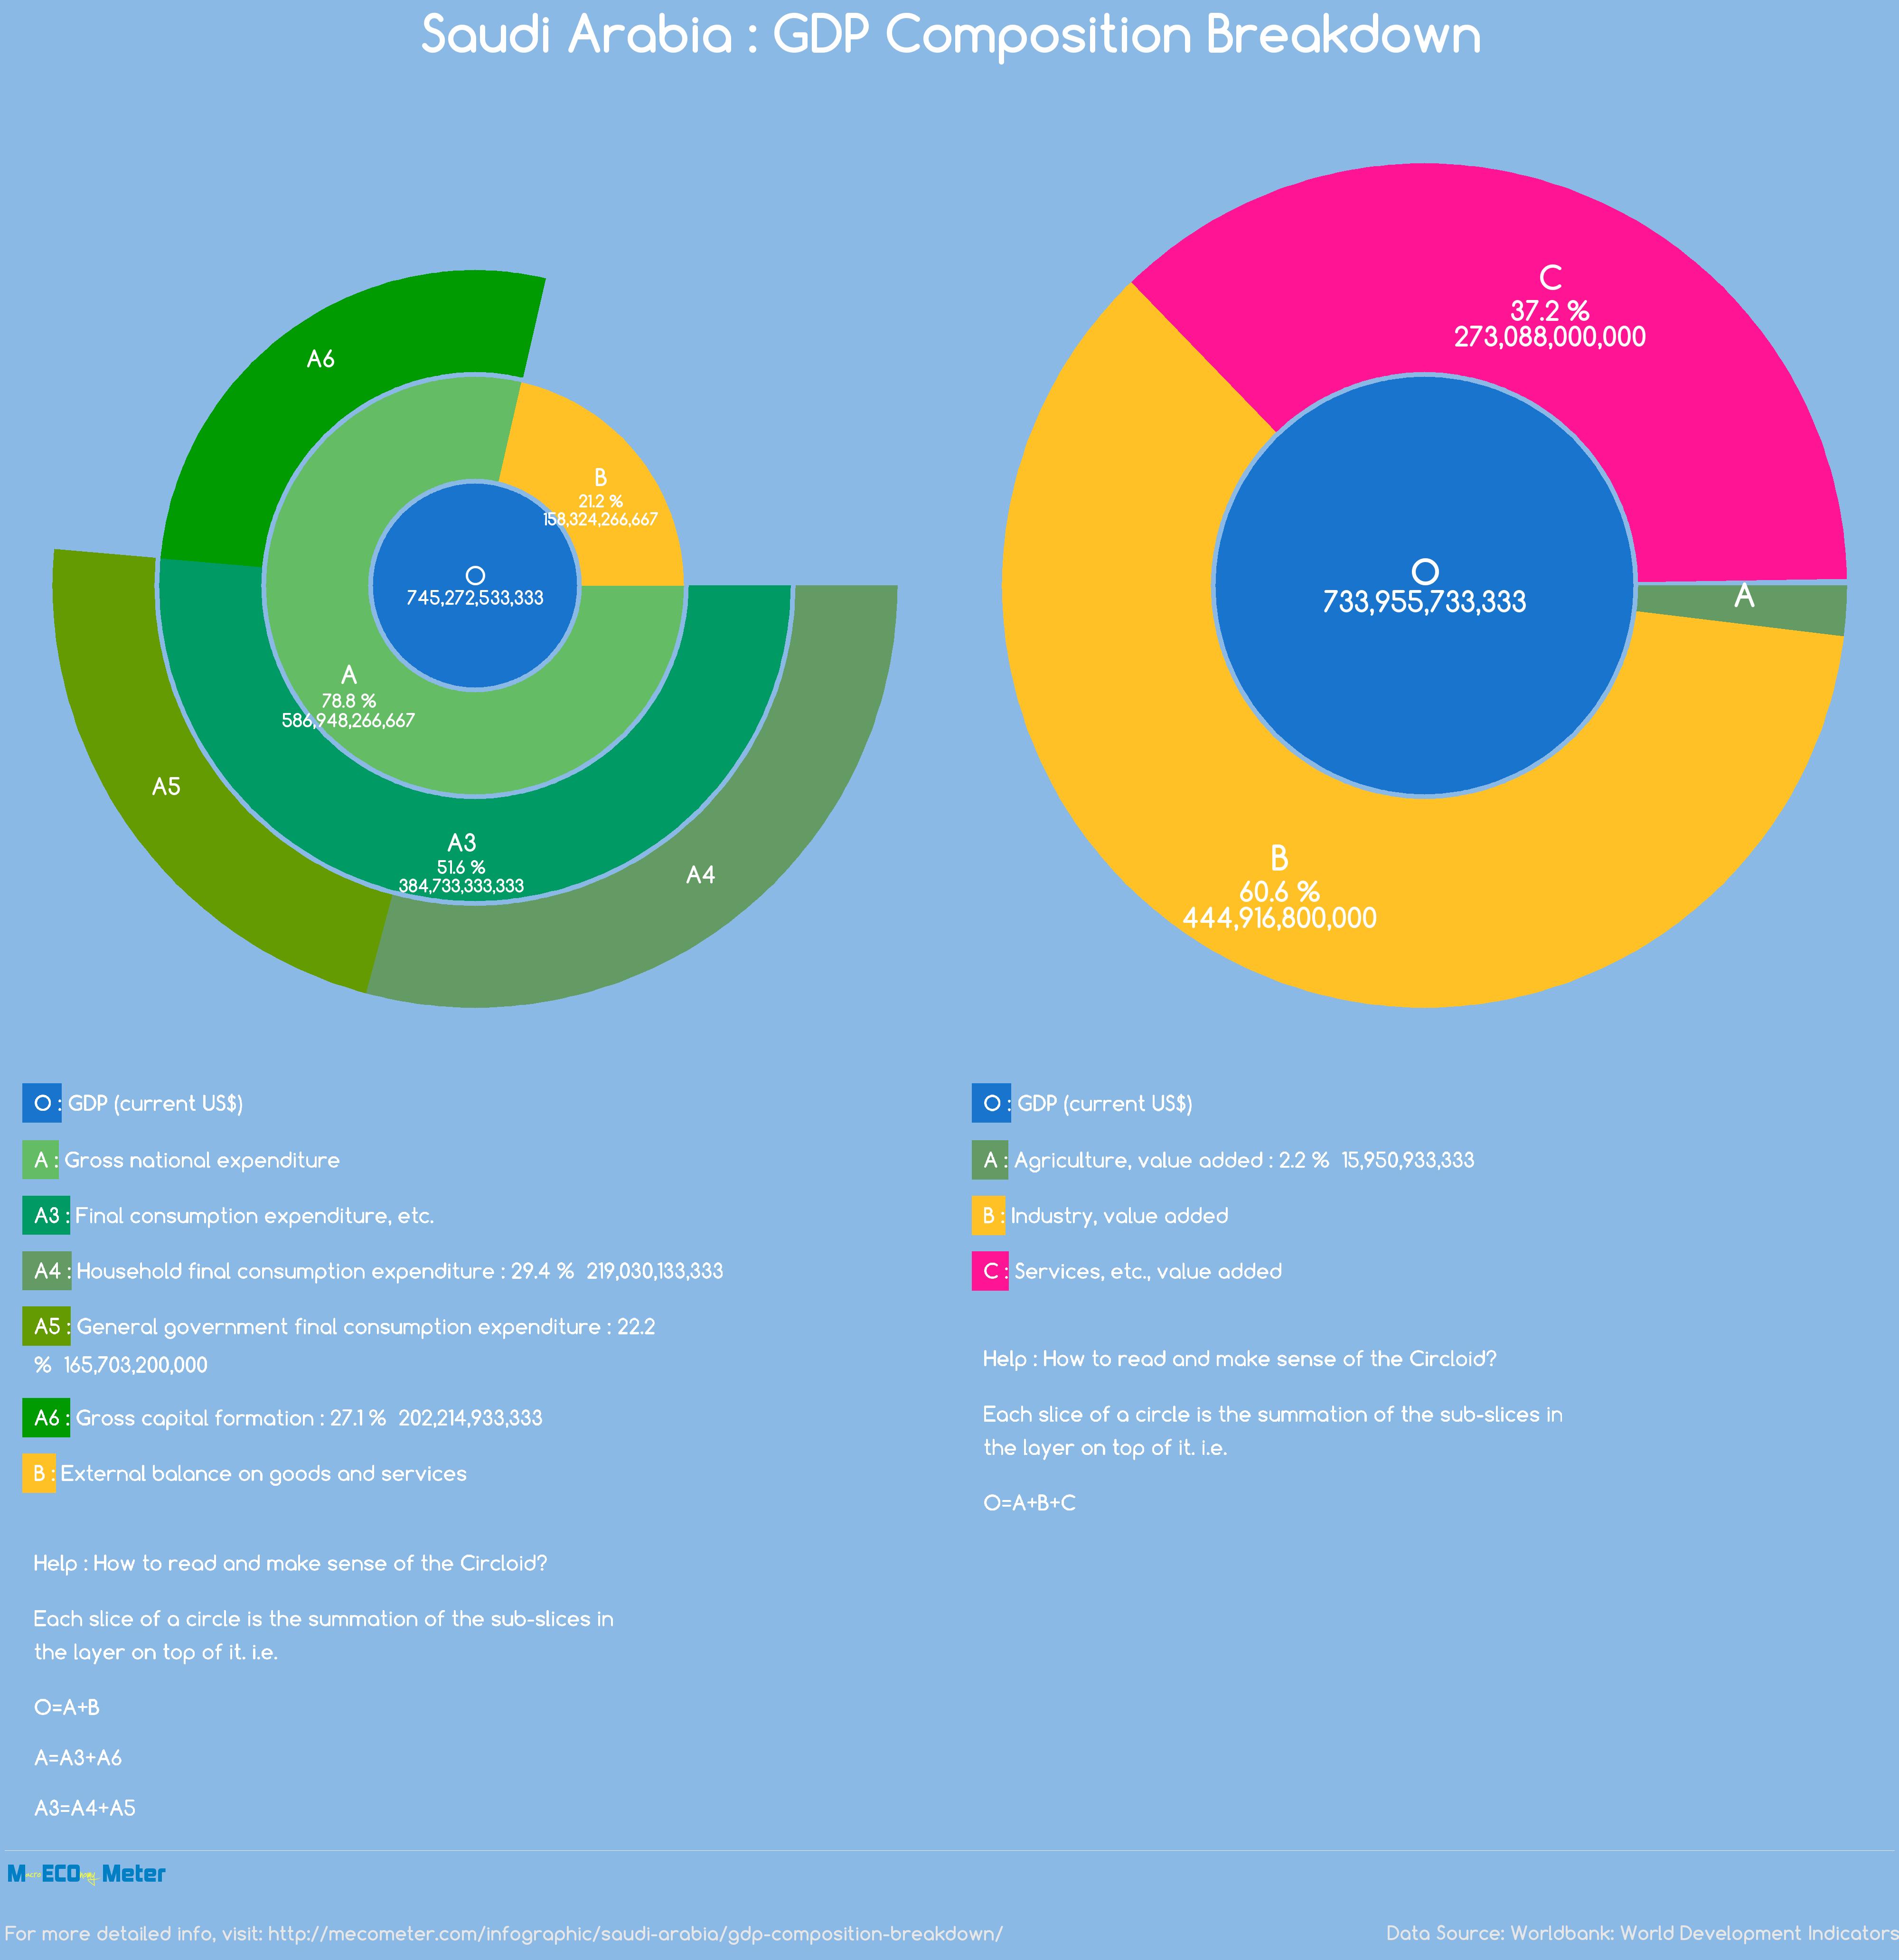 Saudi Arabia : GDP Composition Breakdown